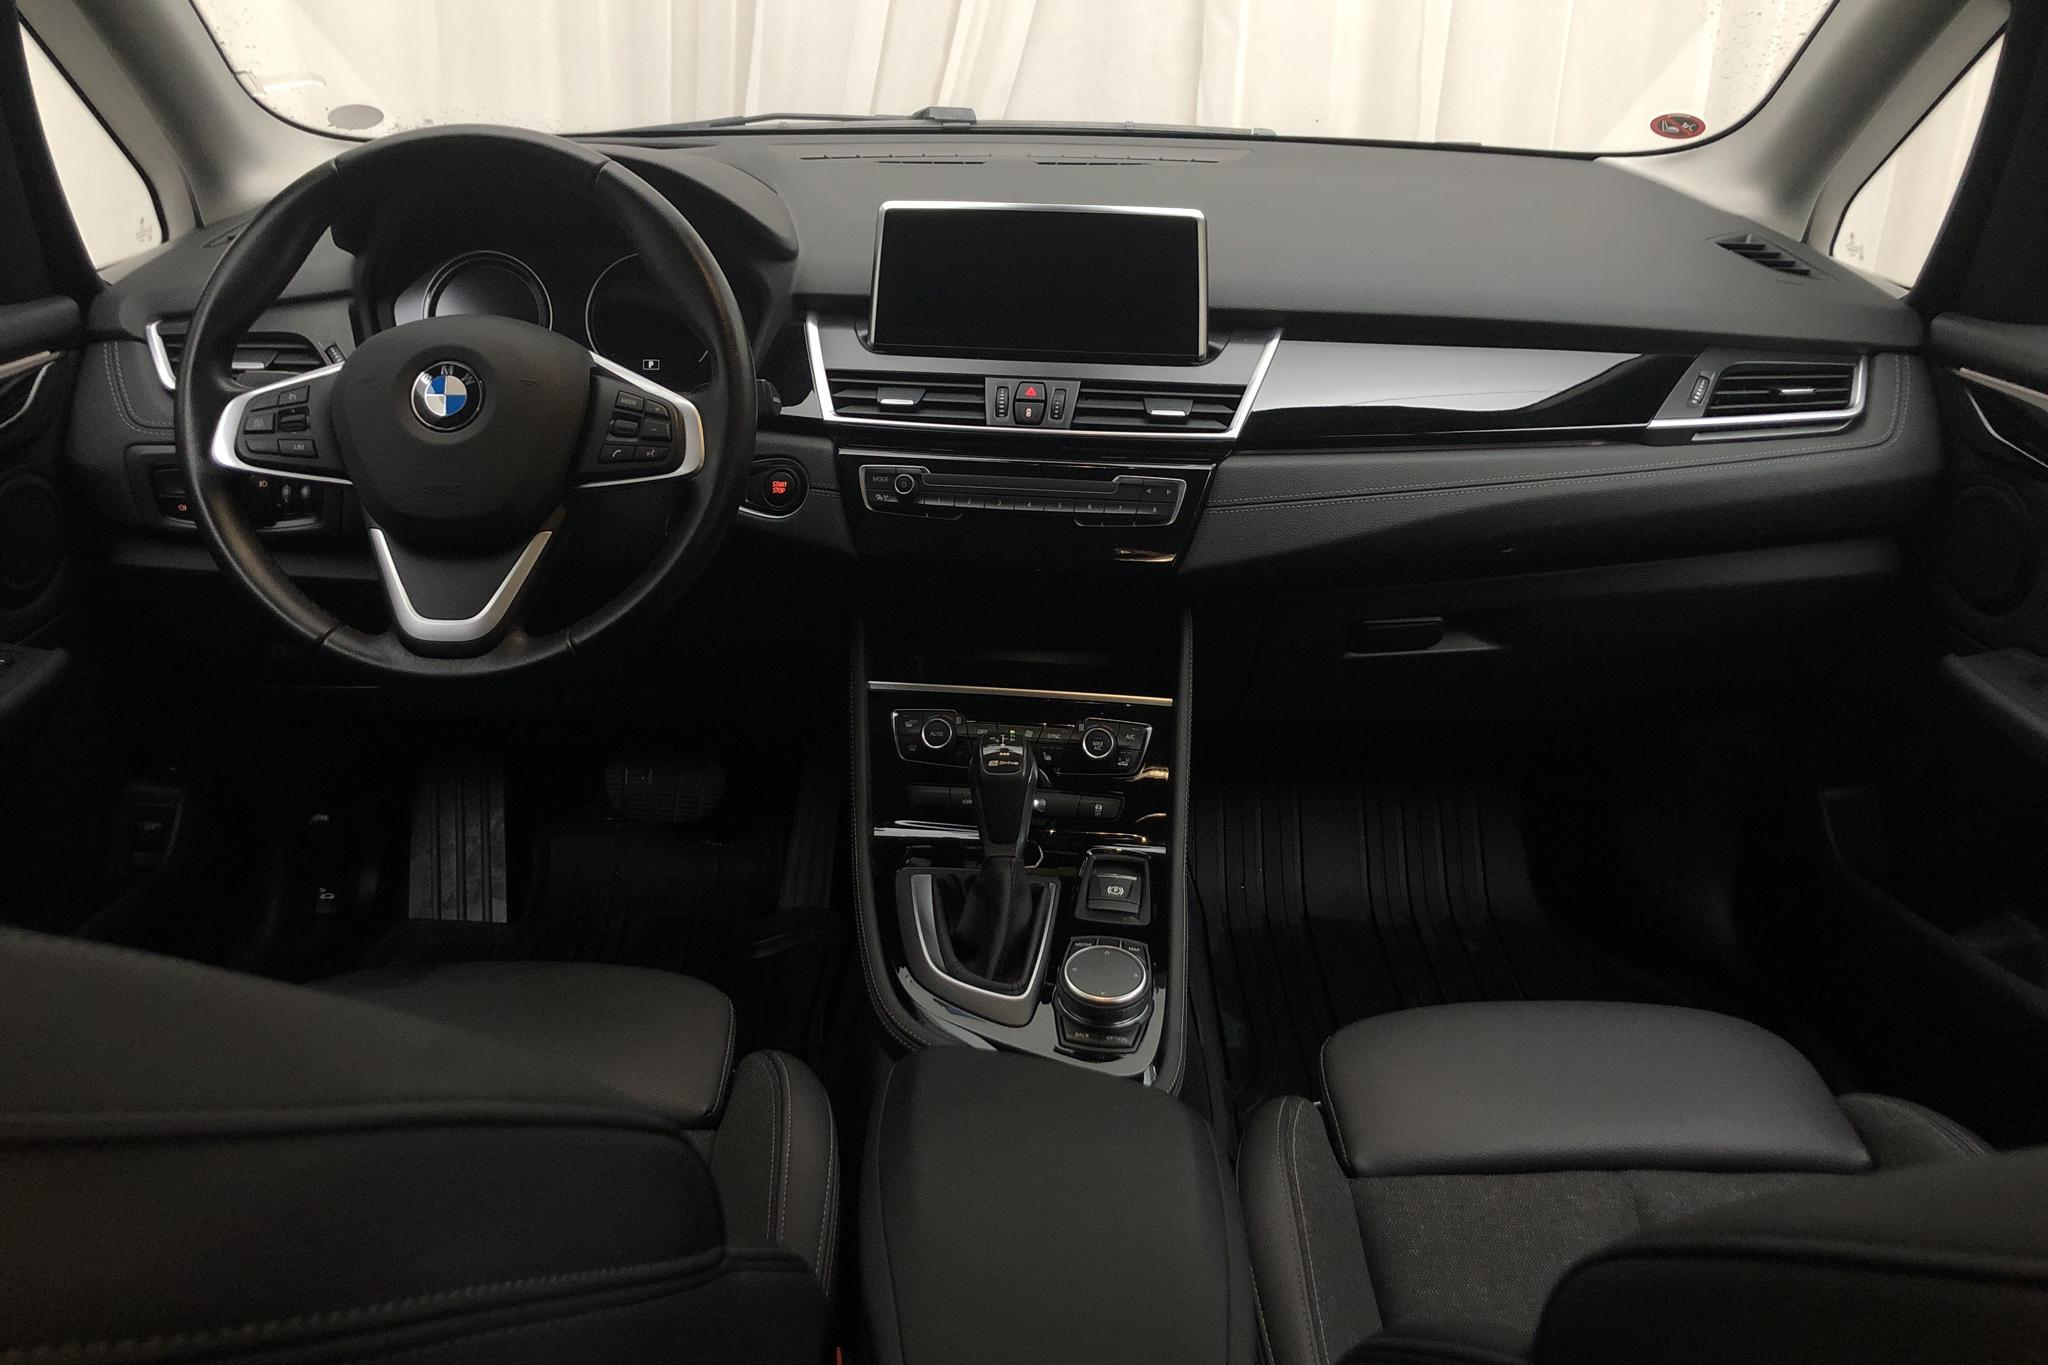 BMW 225xe Active Tourer LCI, F45 (224hk) - 49 290 km - Automatic - black - 2019